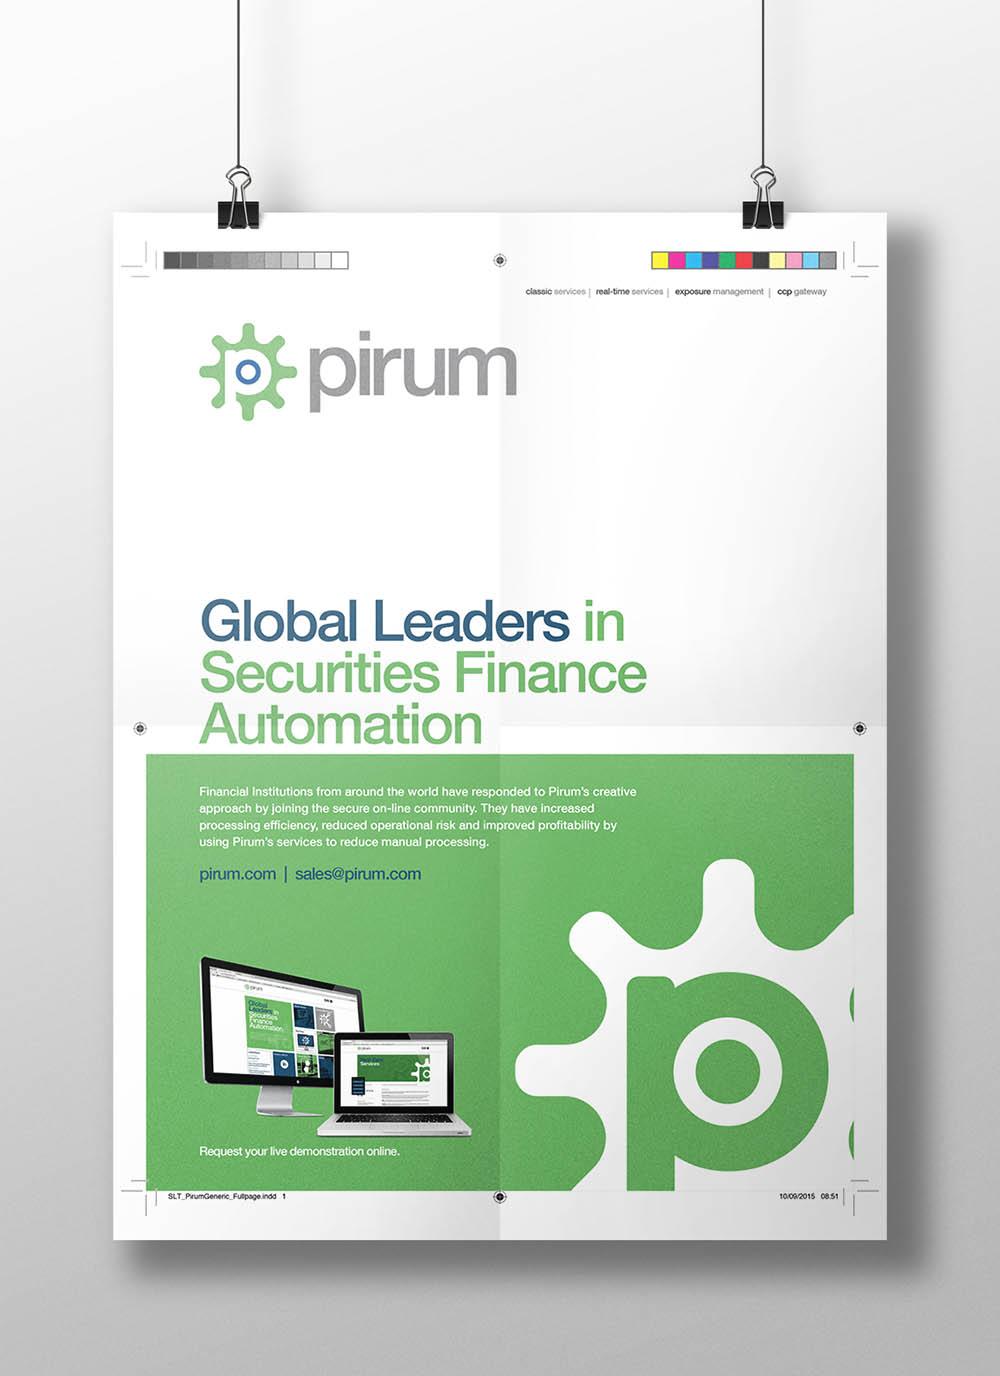 pirum_poster, brand creation, Pirum, Form Advertising, poster